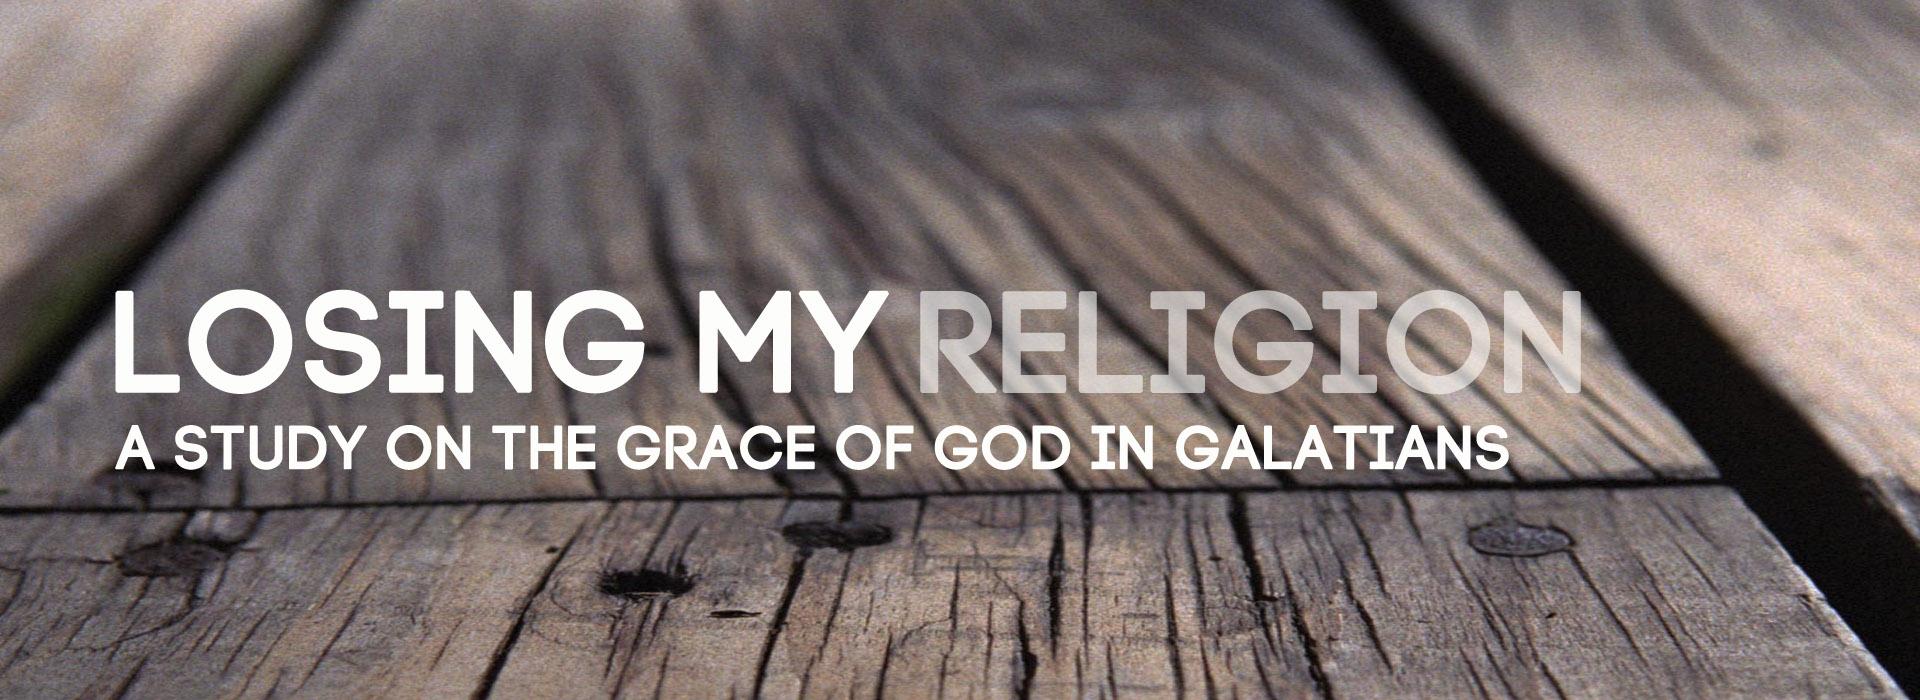 Losing-My-Religion-Series-Graphic-JPG